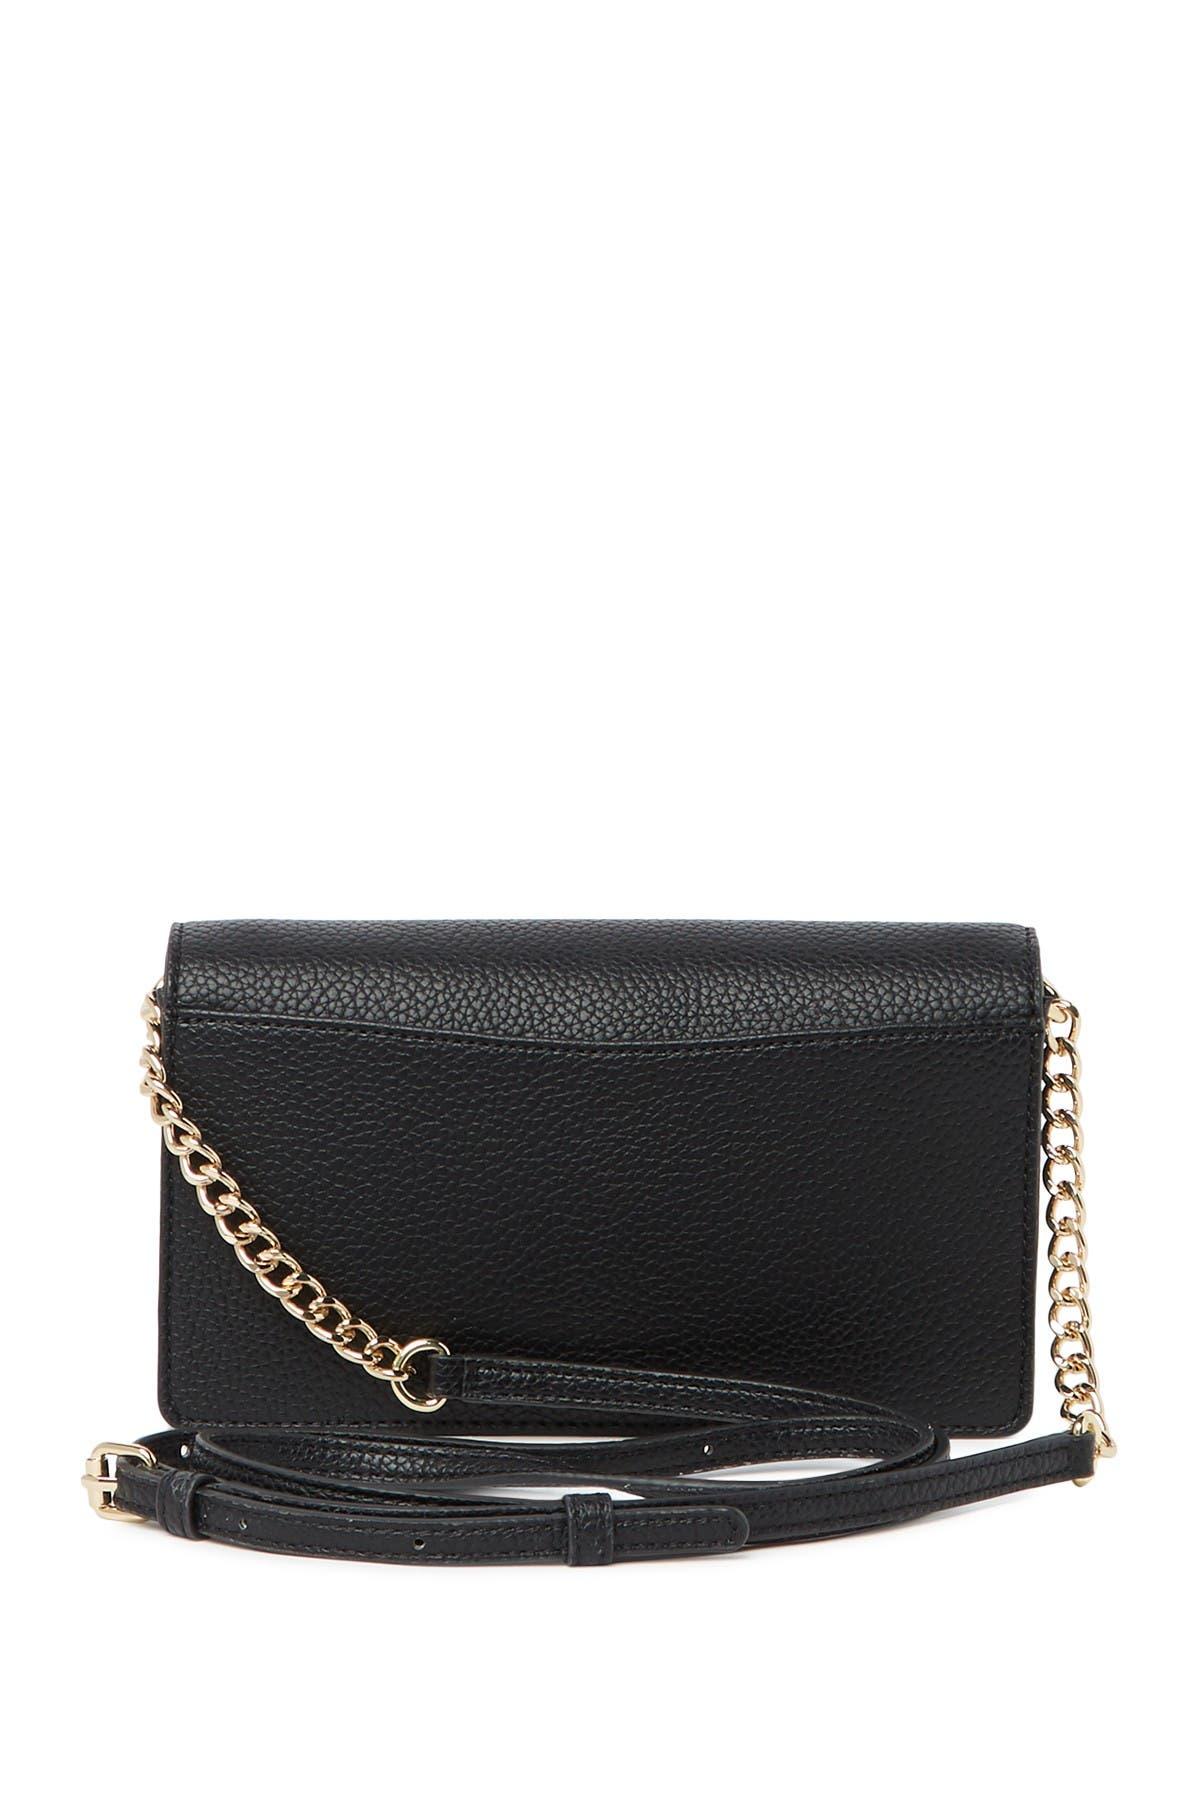 Image of Calvin Klein Crossbody Chain Wallet Bag